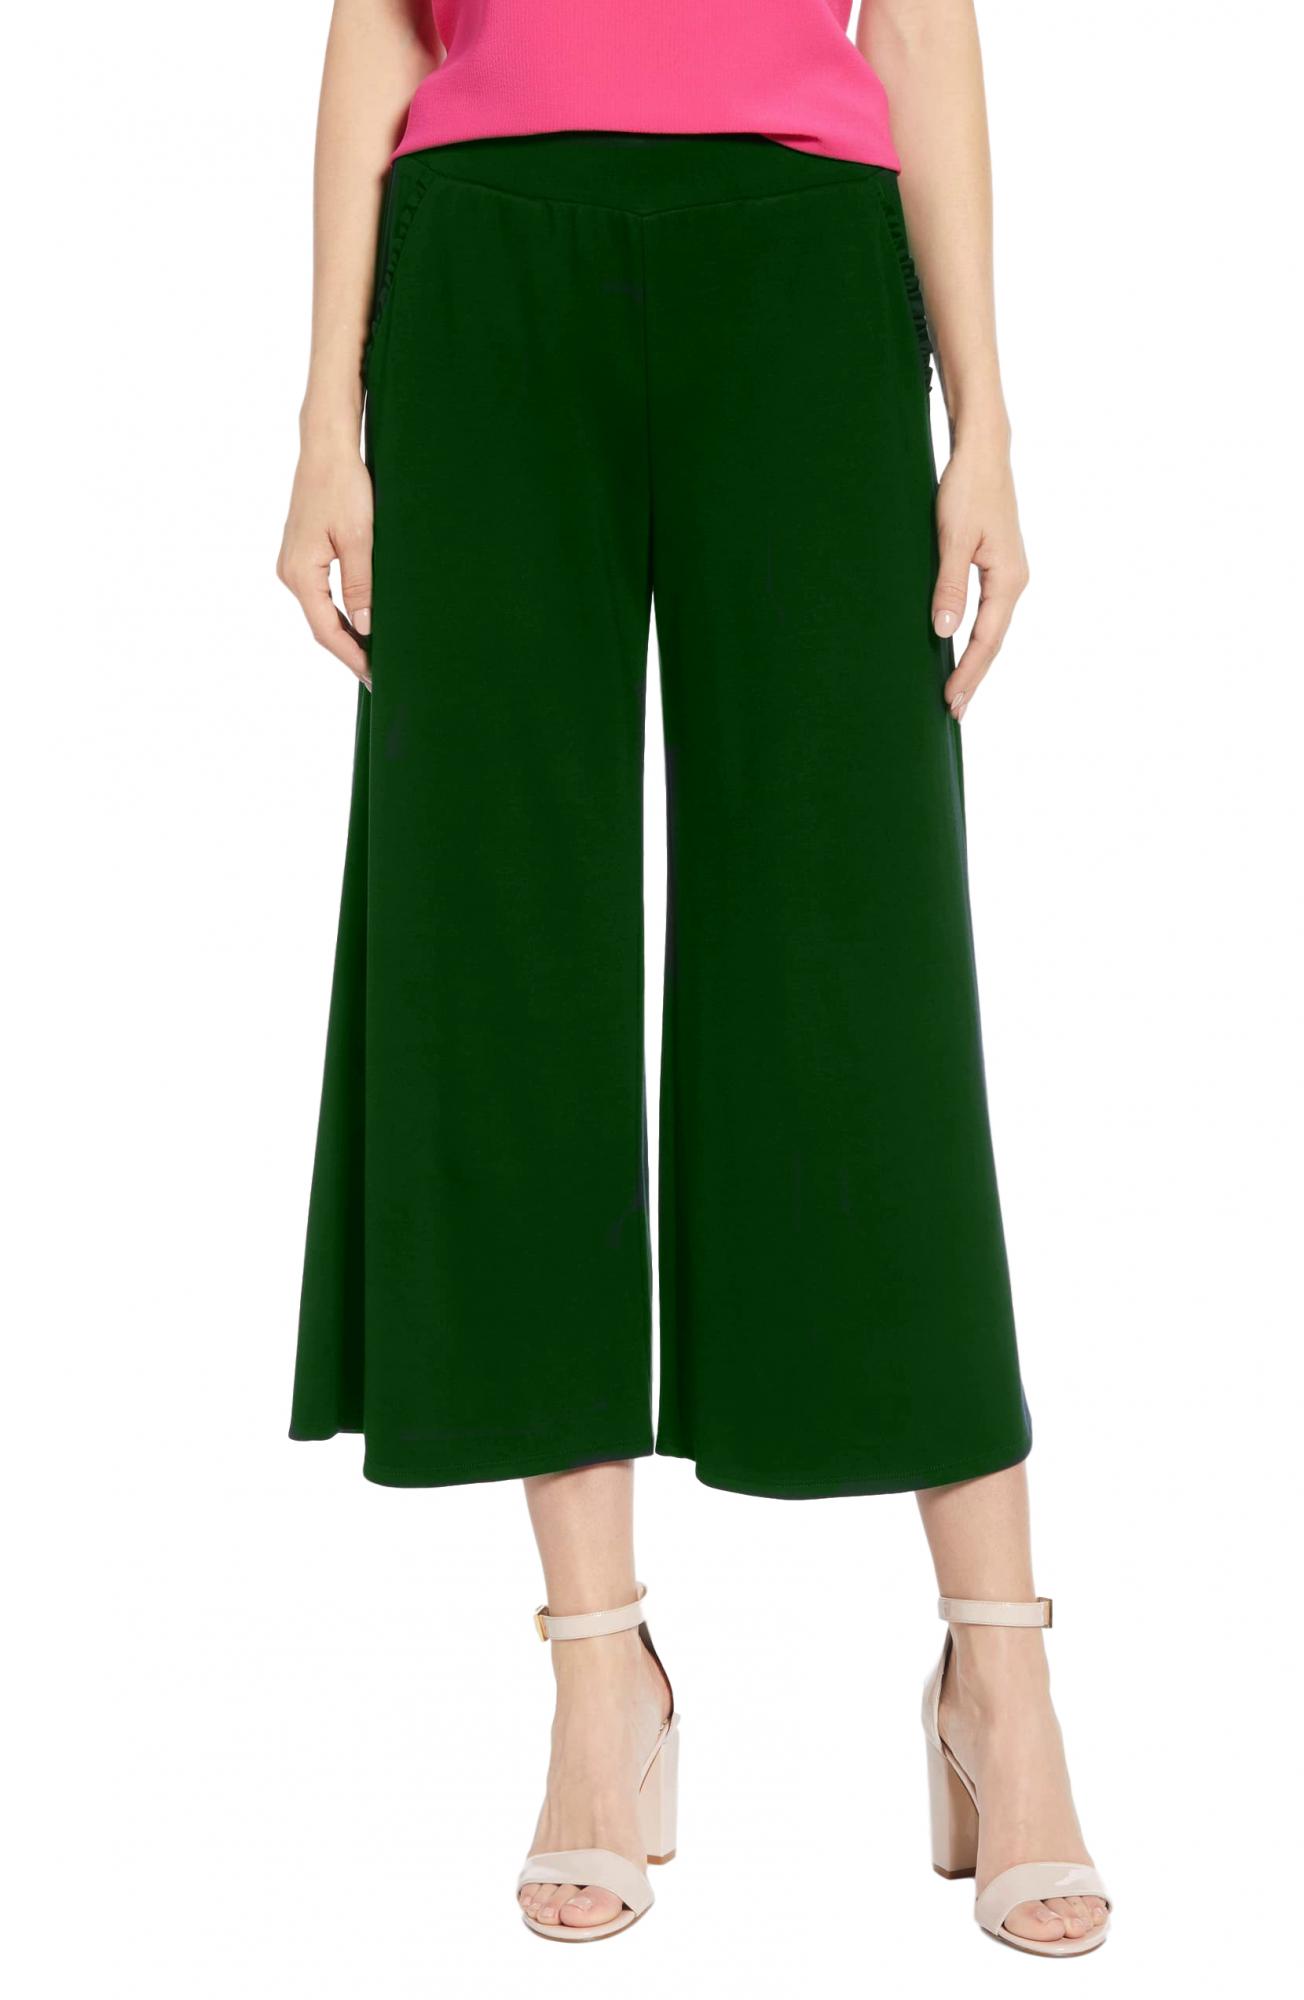 Regular Fit Tie Capri Trouser Pant in Bottle Green